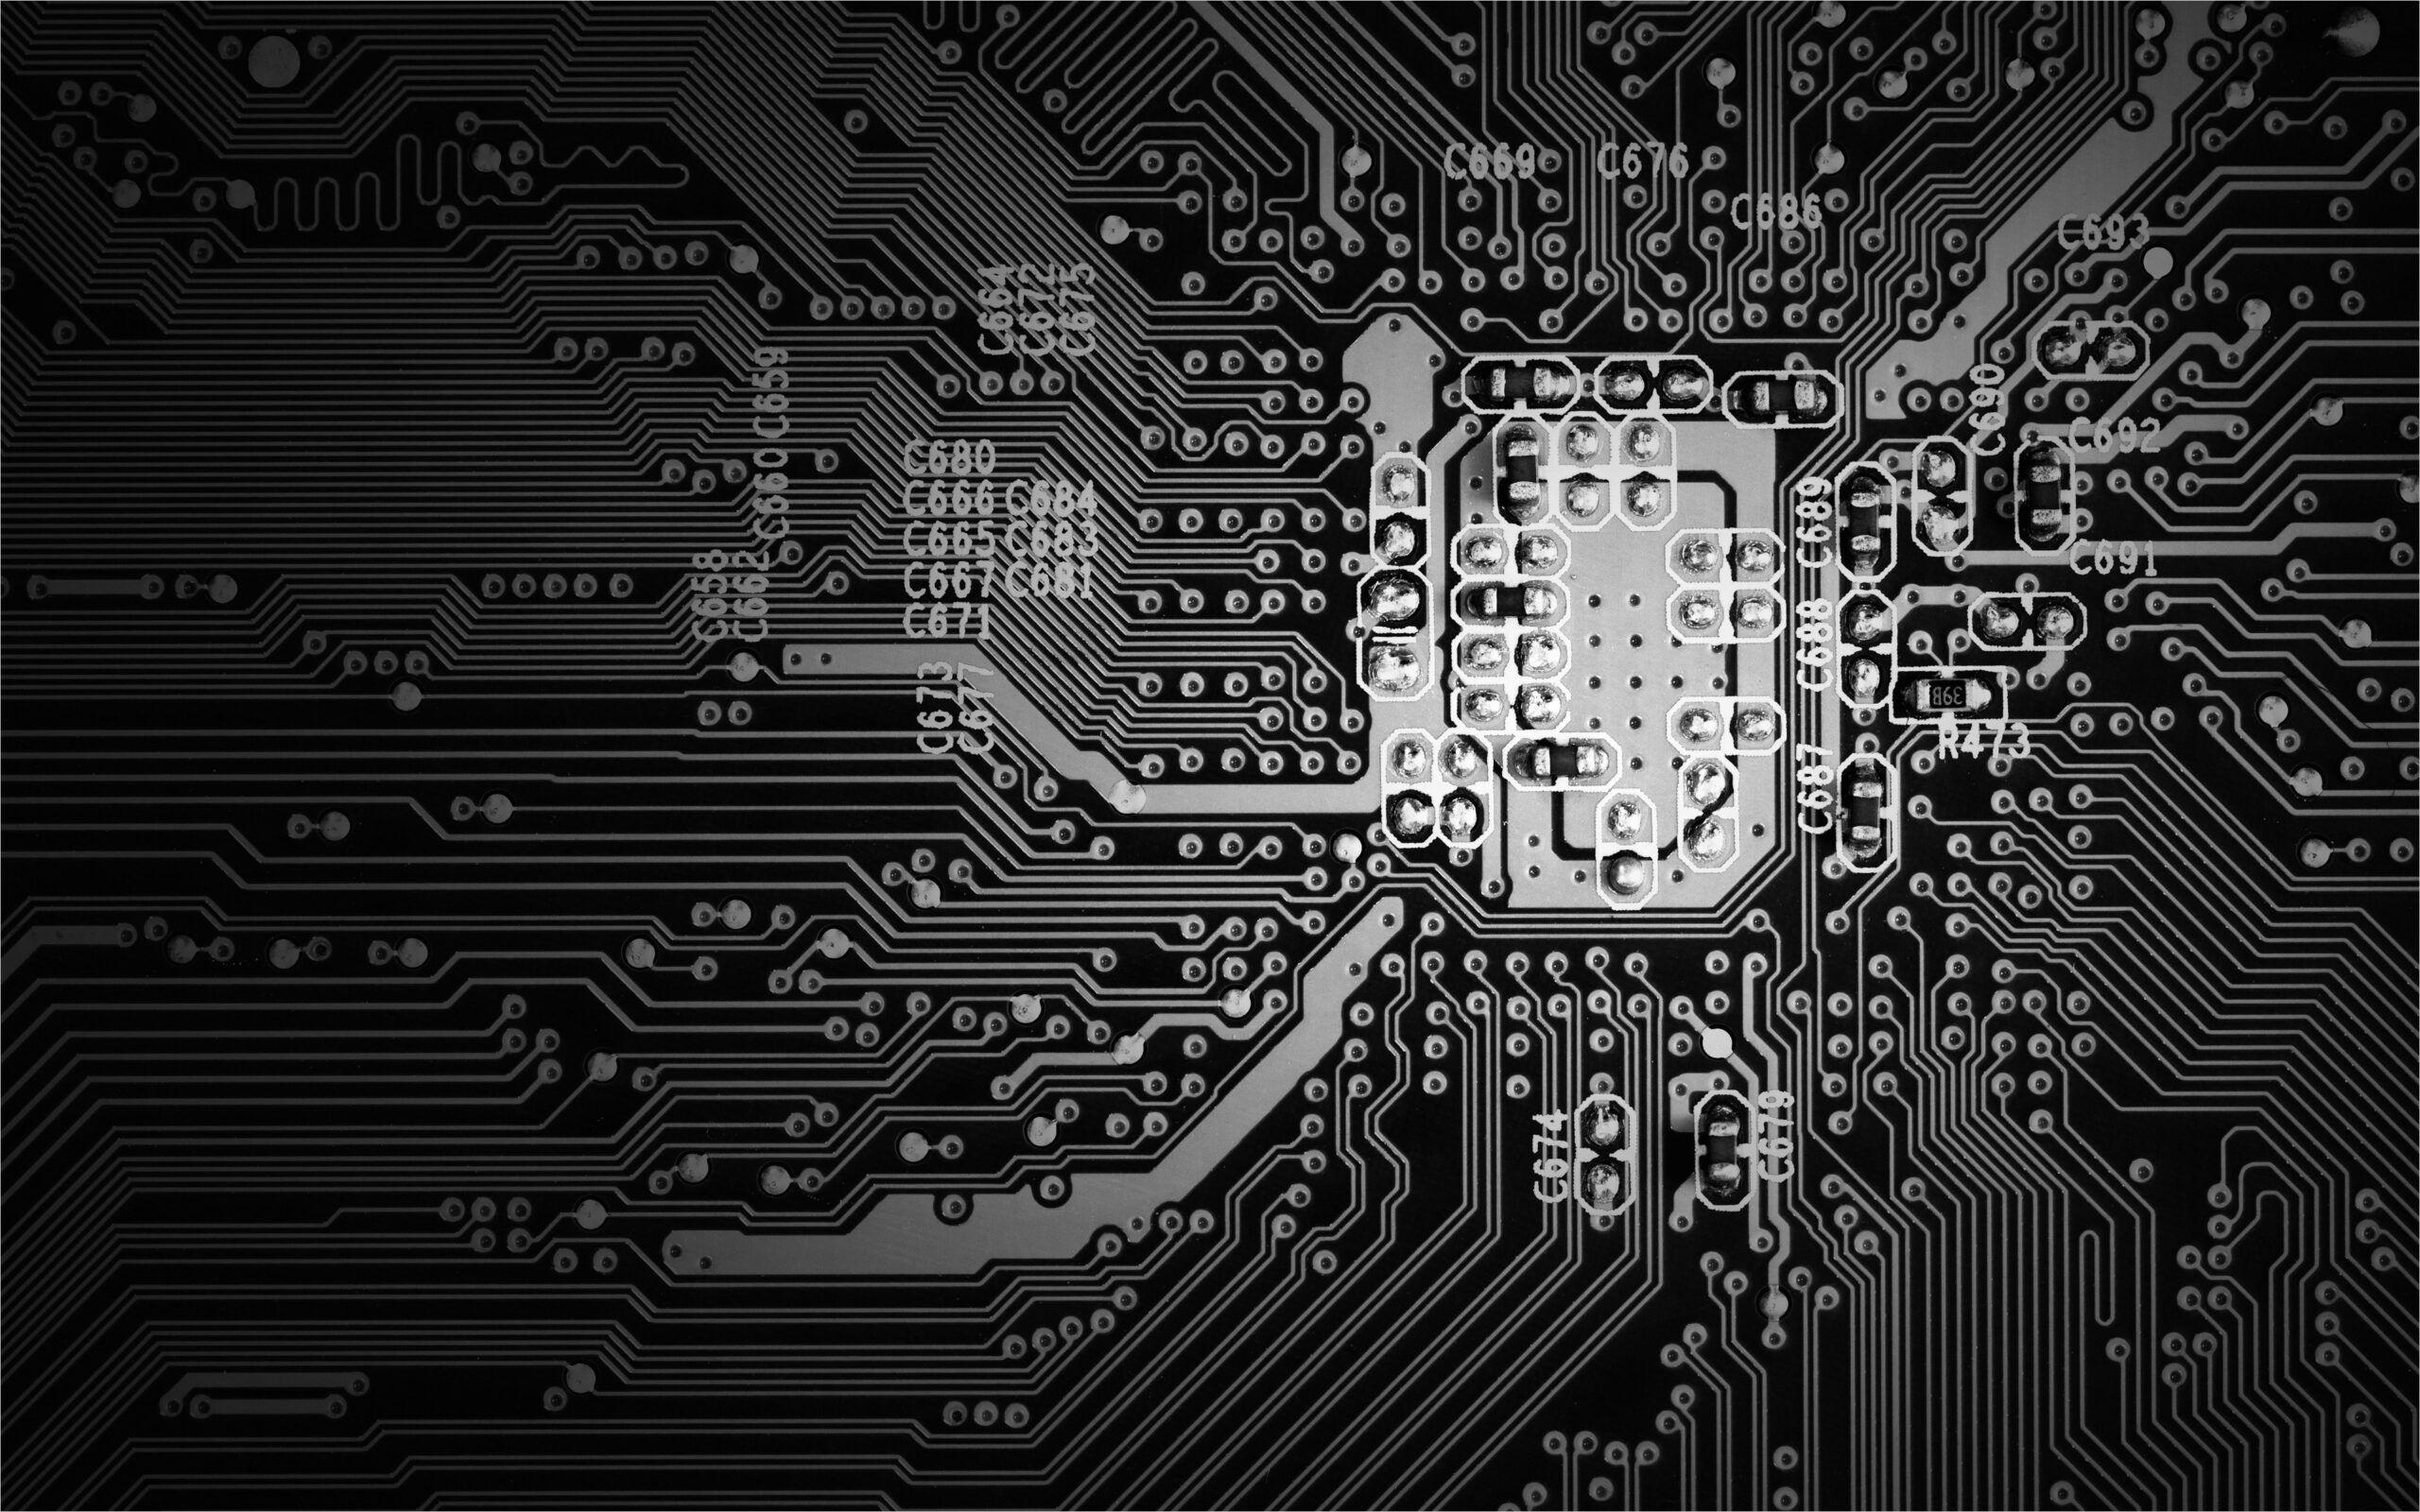 Cpu Motherboard Geek Electrical Network Computer Hardware Technology 4k Wallpaper Hdwallpa In 2020 Electronics Background Electronics Circuit Electronics Poster